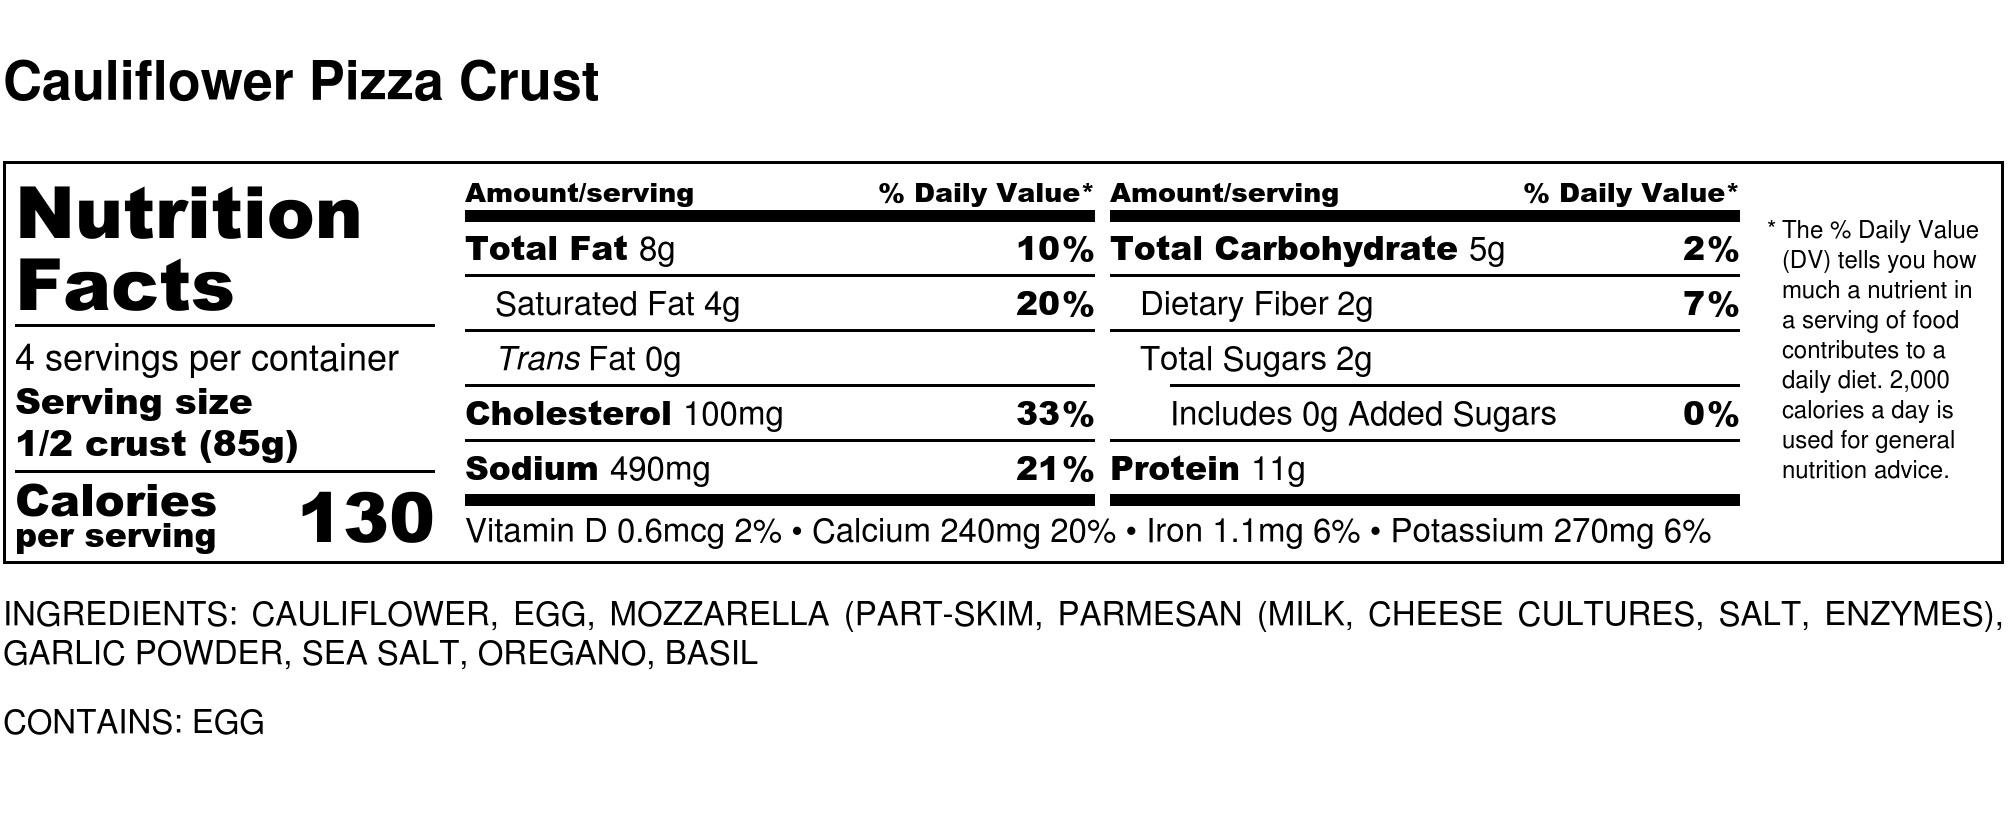 Cauliflower Pizza Crust - 4 servings- 2 crusts.jpg